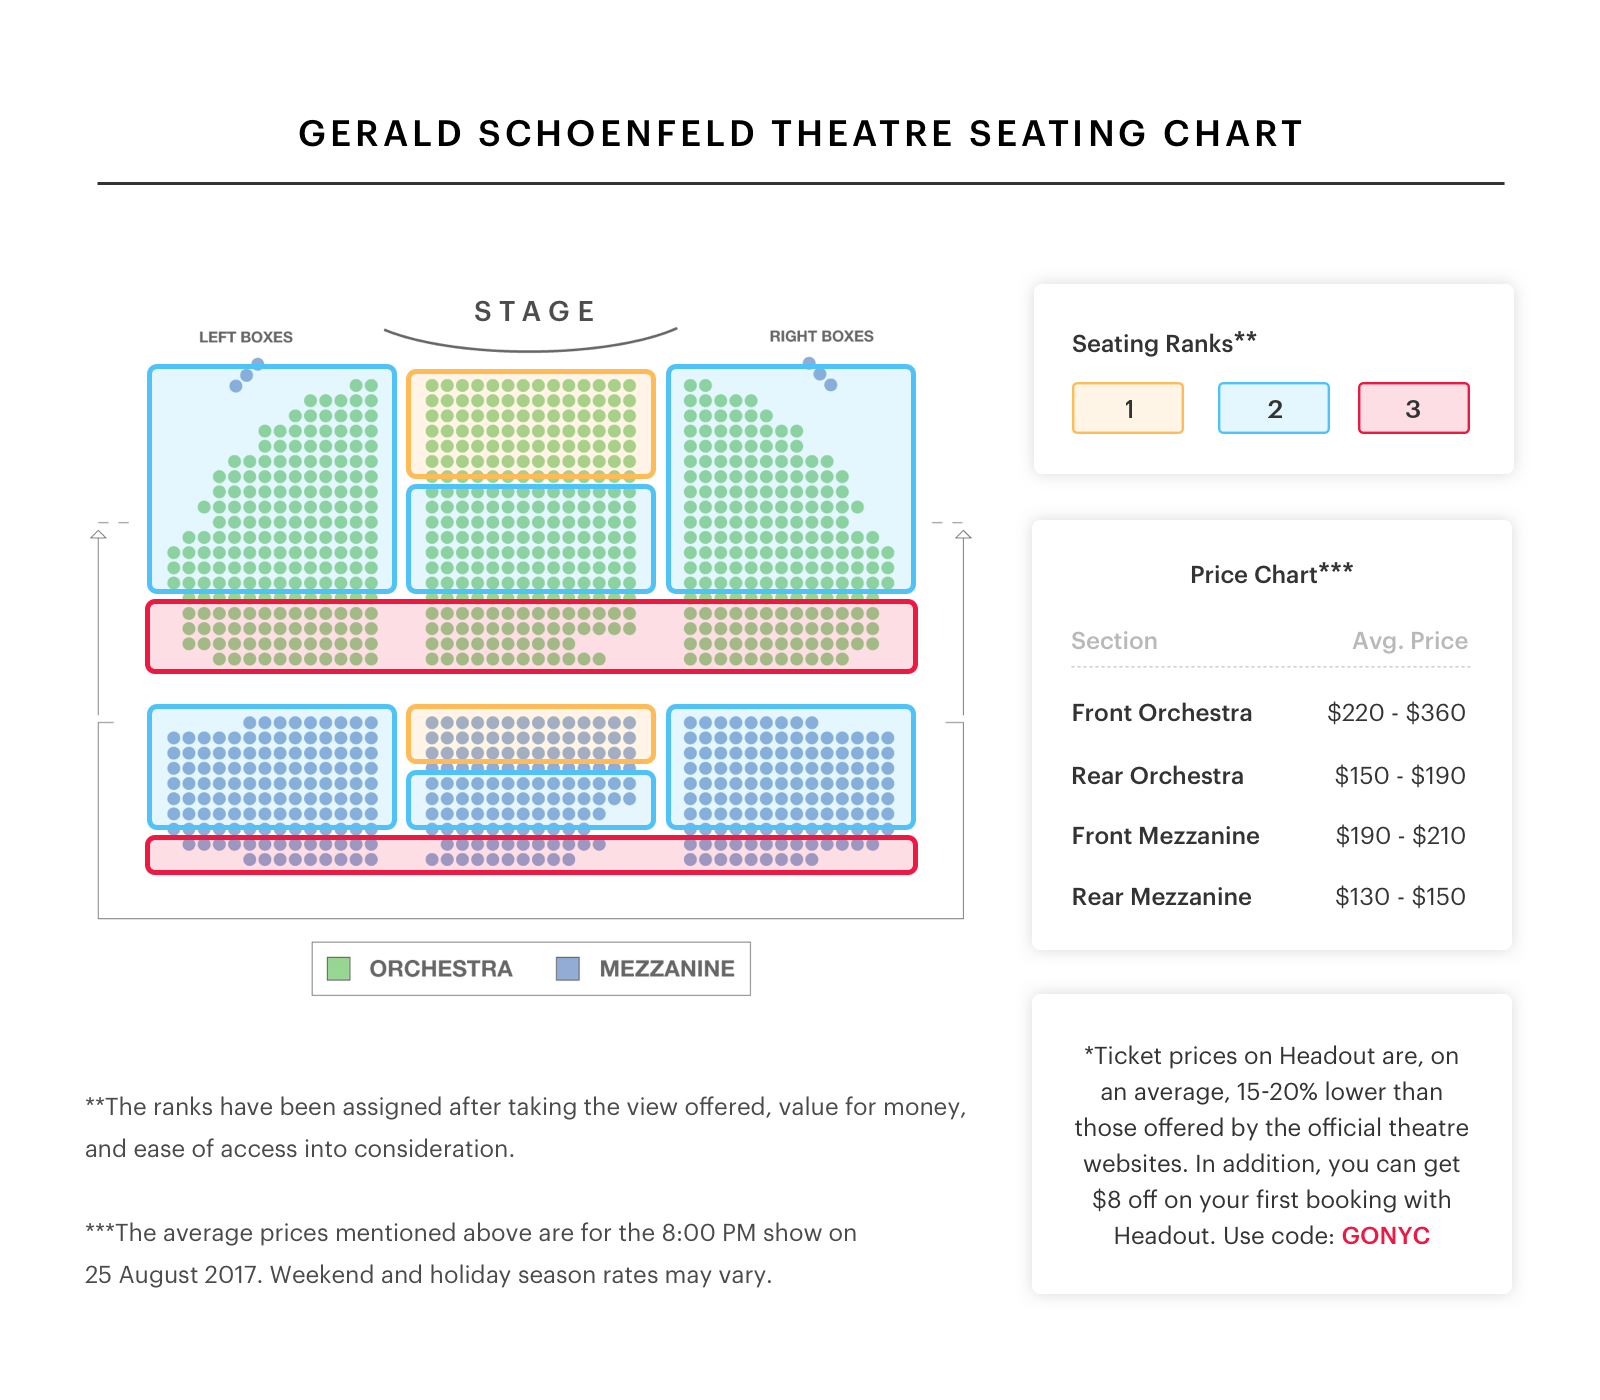 Schoenfeld-Theatre-Seating-Chart